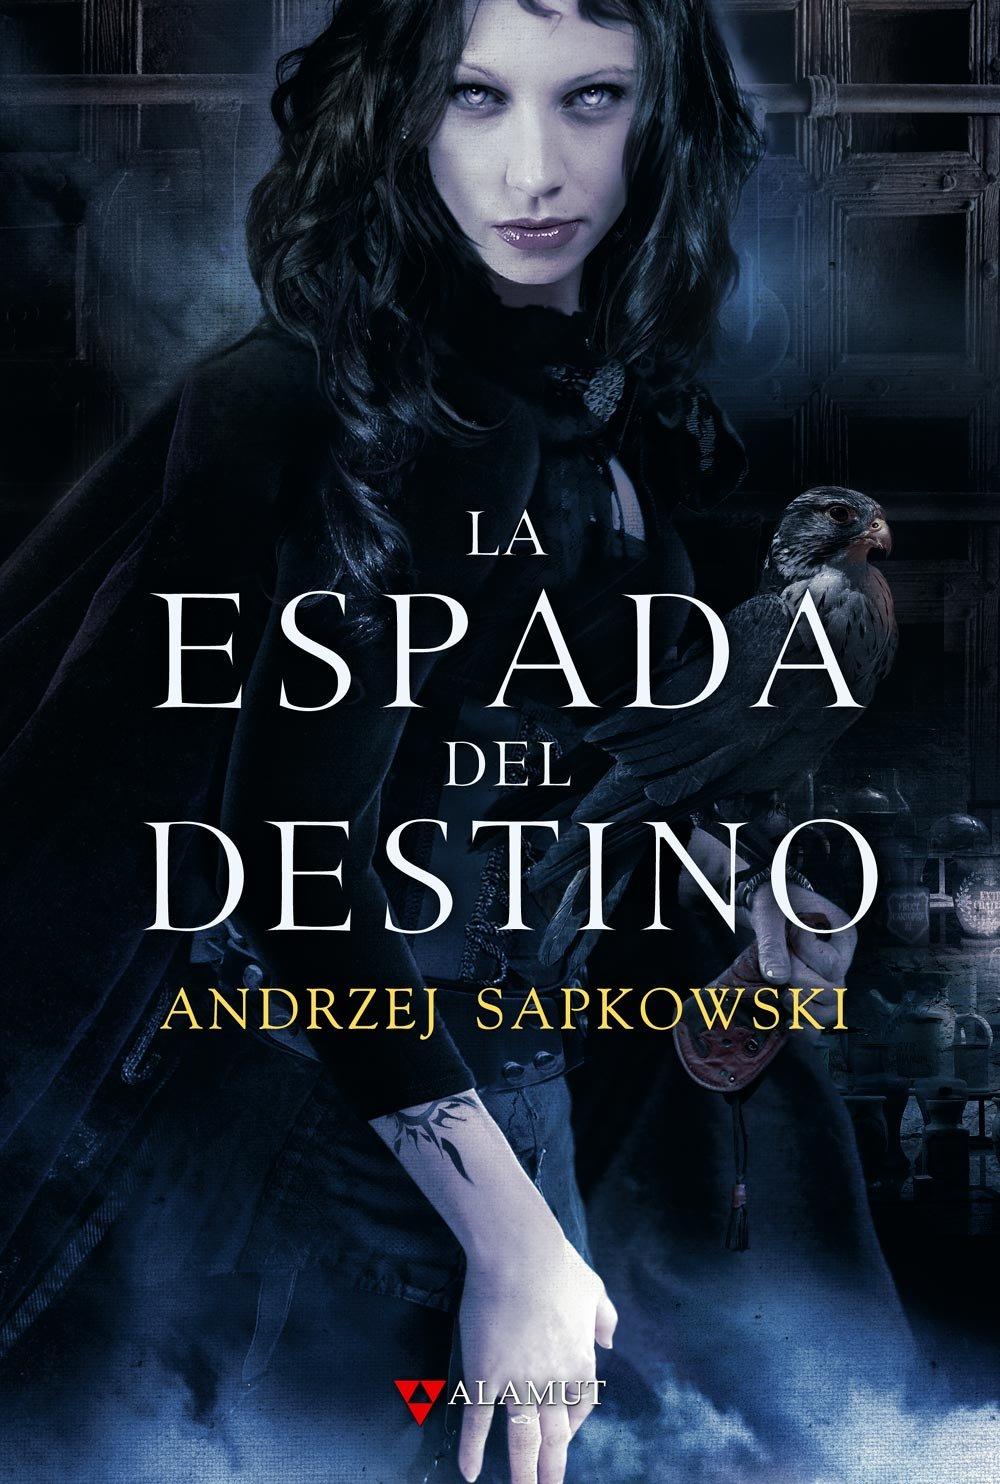 http://labibliotecadebella.blogspot.com.es/2016/12/la-espada-del-destino-andrzej-sapkowski.html